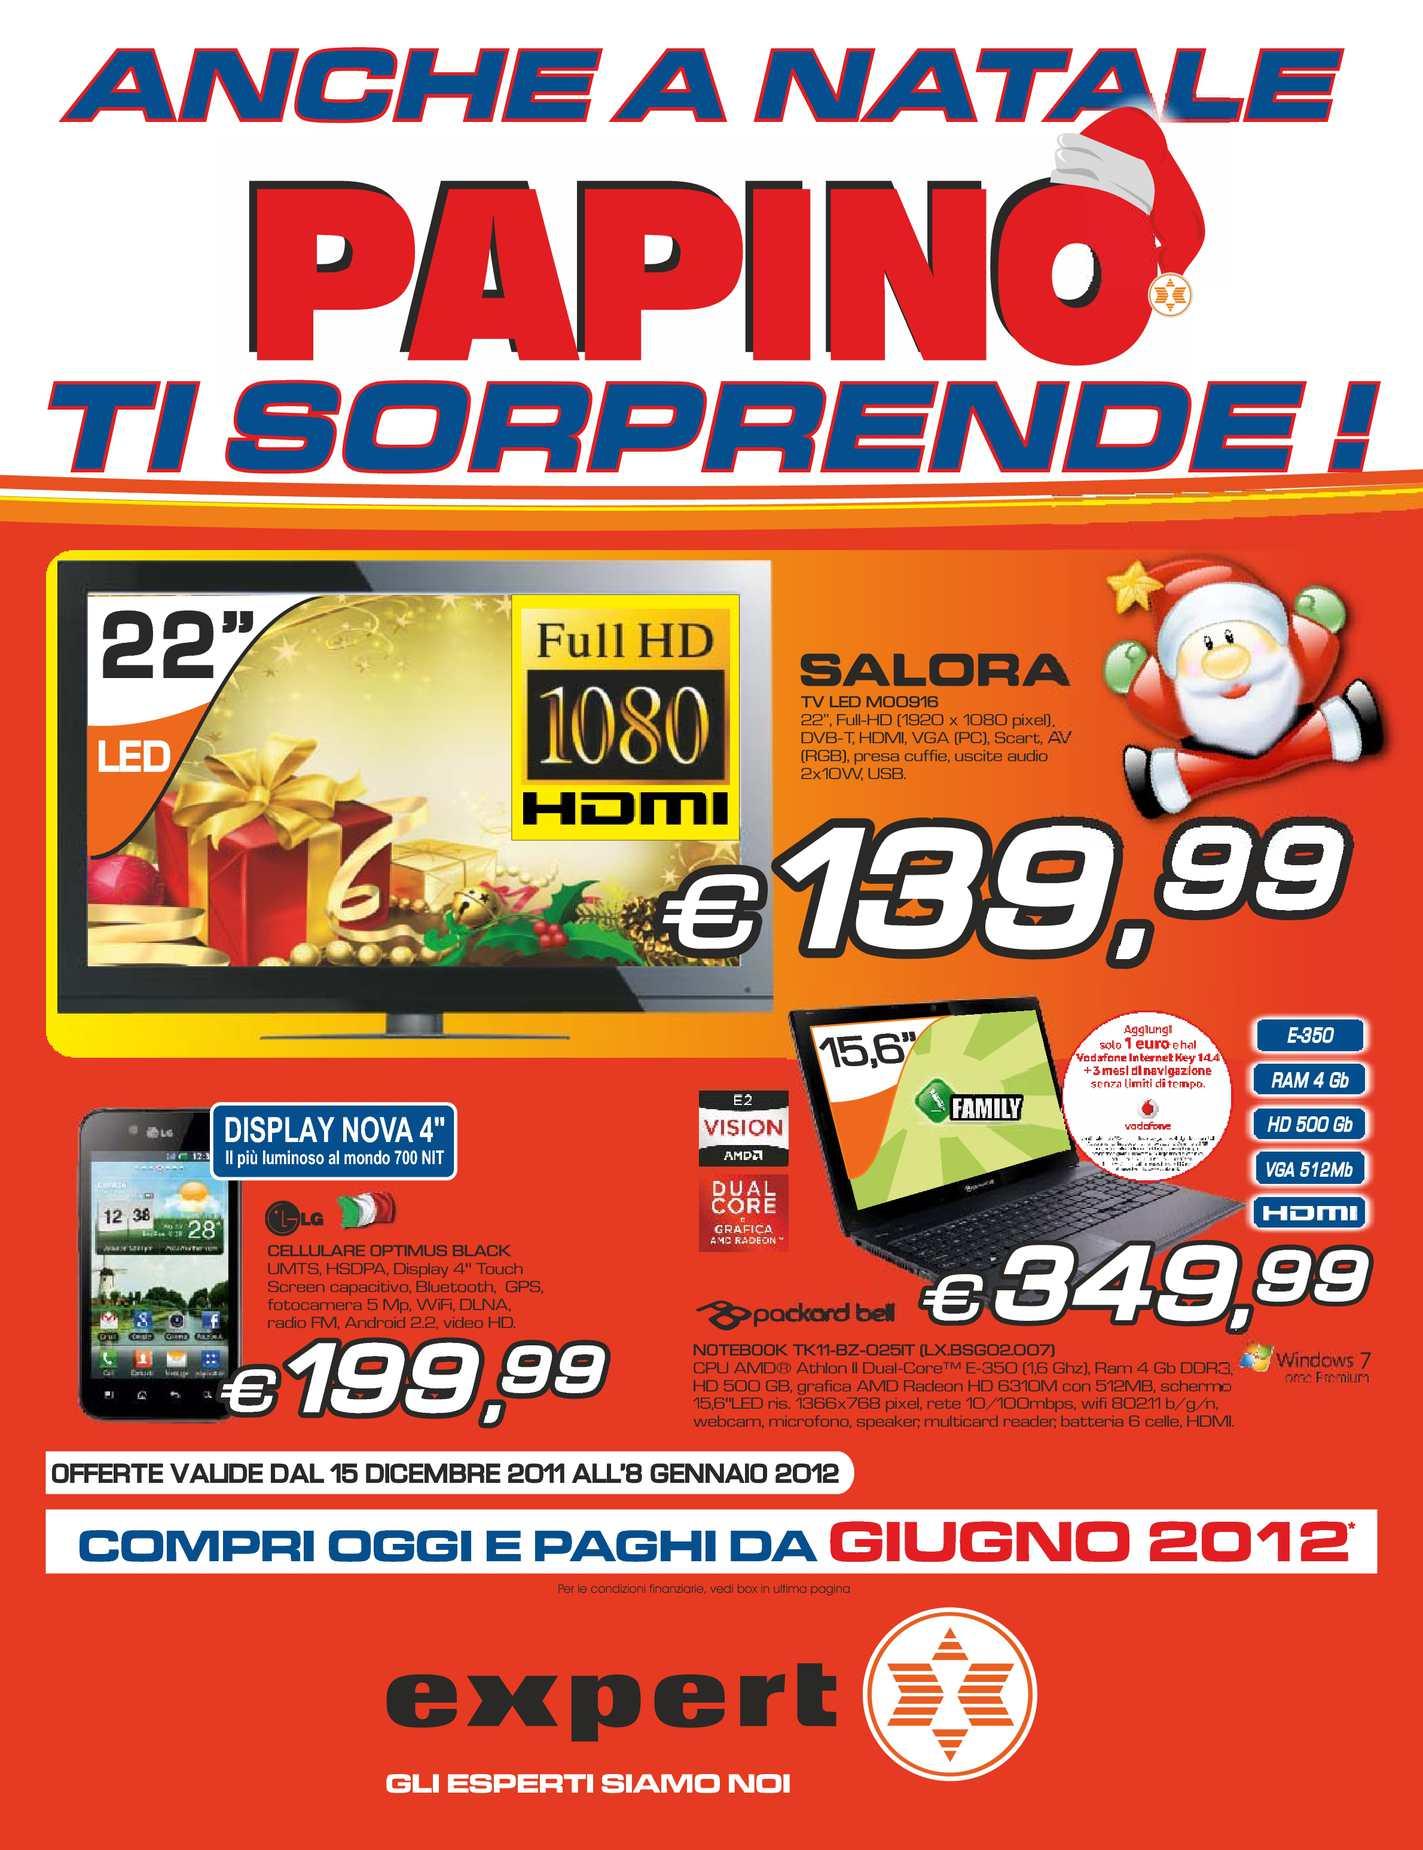 Calaméo - Volantino Expert gruppo Papino dal 15/12/2011 al ...